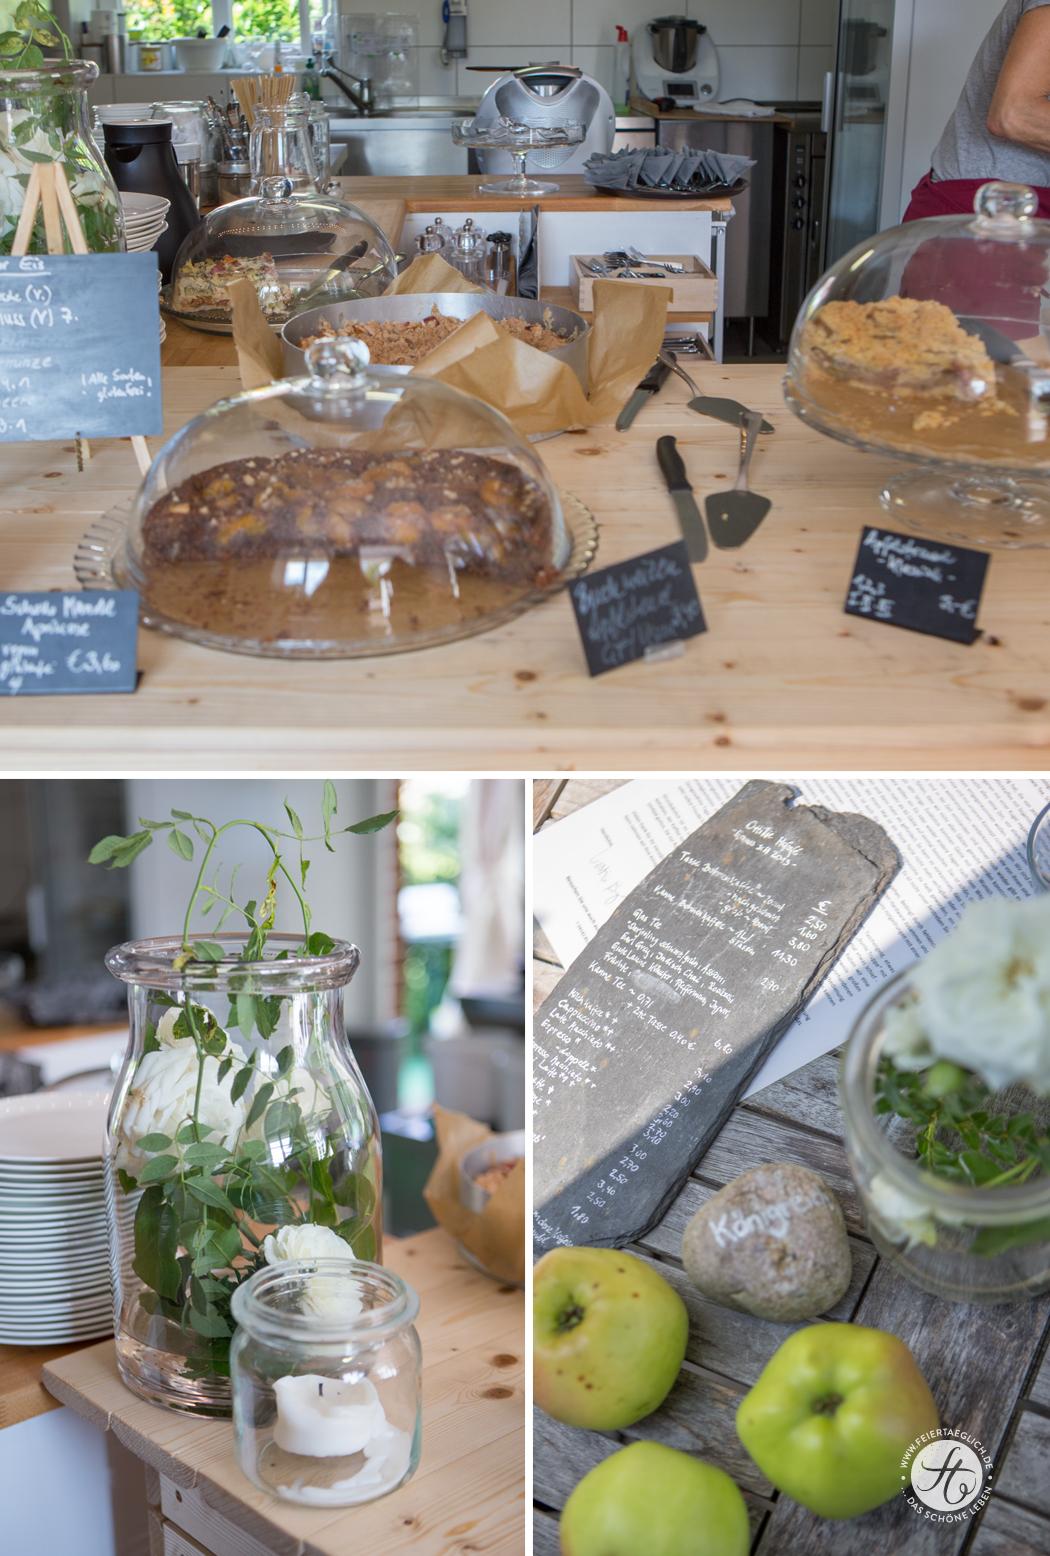 Blogevent-Apfelbaeckchen_BiohofOttilie_Cafe